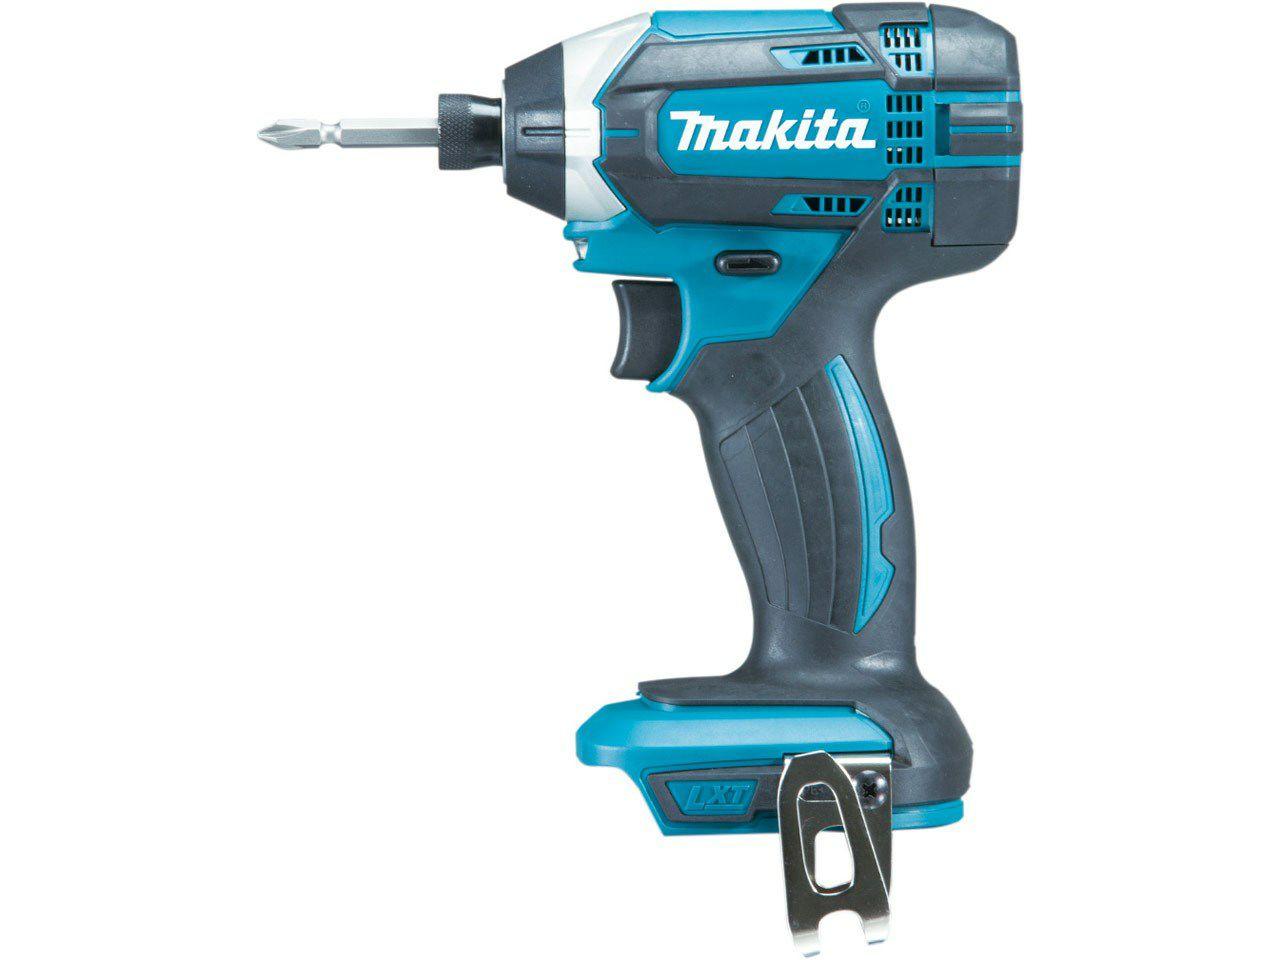 Makita DTD152Z 18v LXT Impact Driver Bare Unit - £54.99 (Delivered) @ Powertoolmate ebay